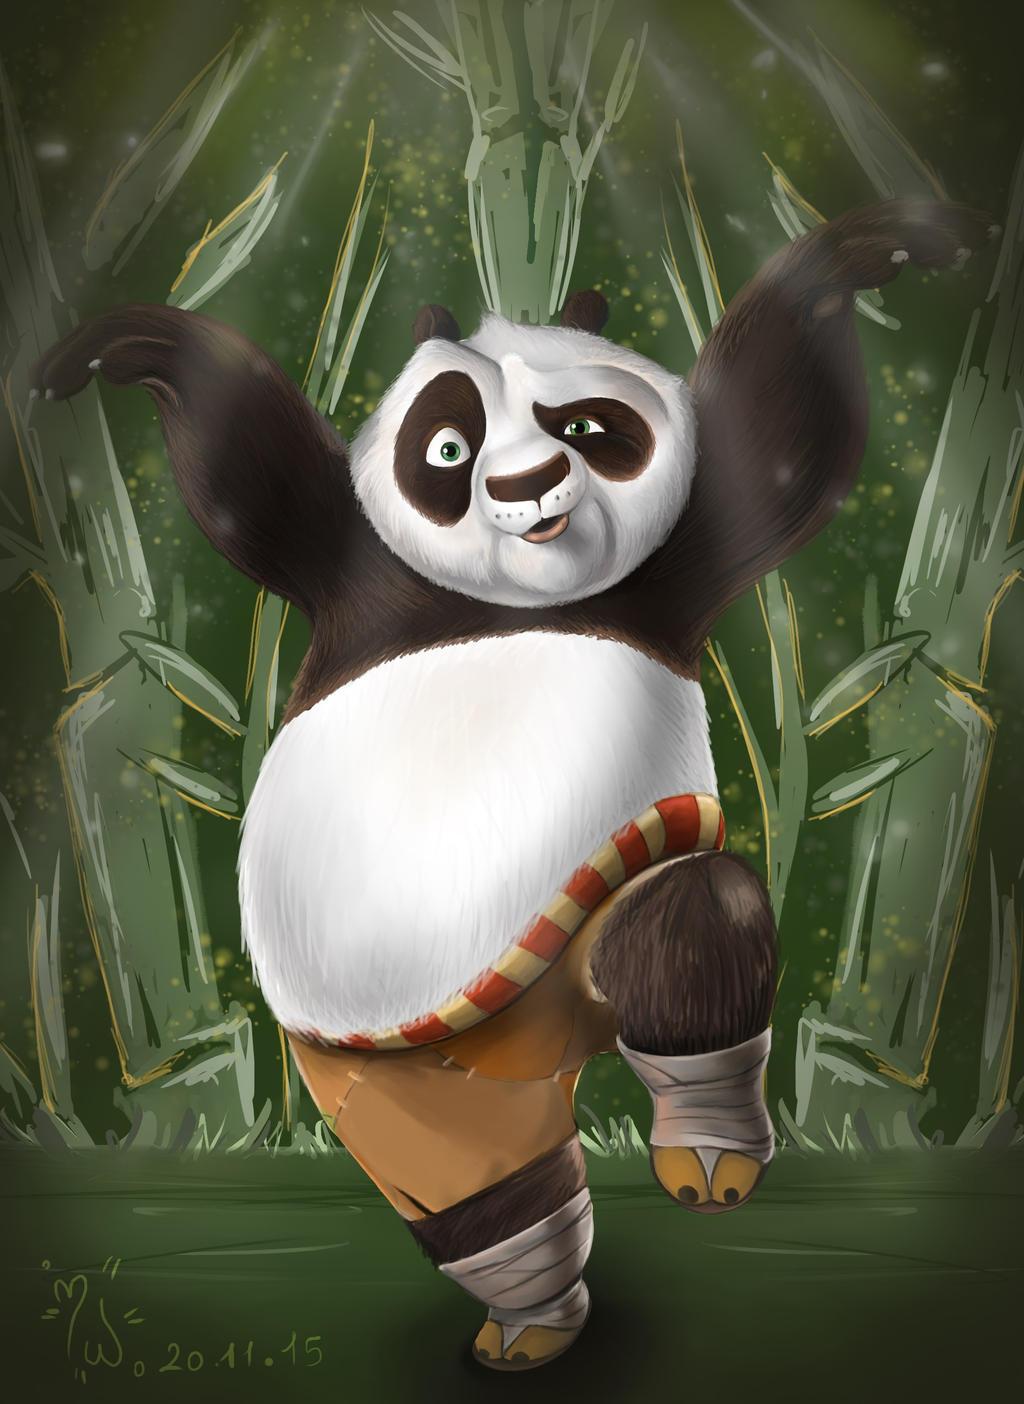 Kung Fu Panda - Mei Ling by Stitchfan on DeviantArt